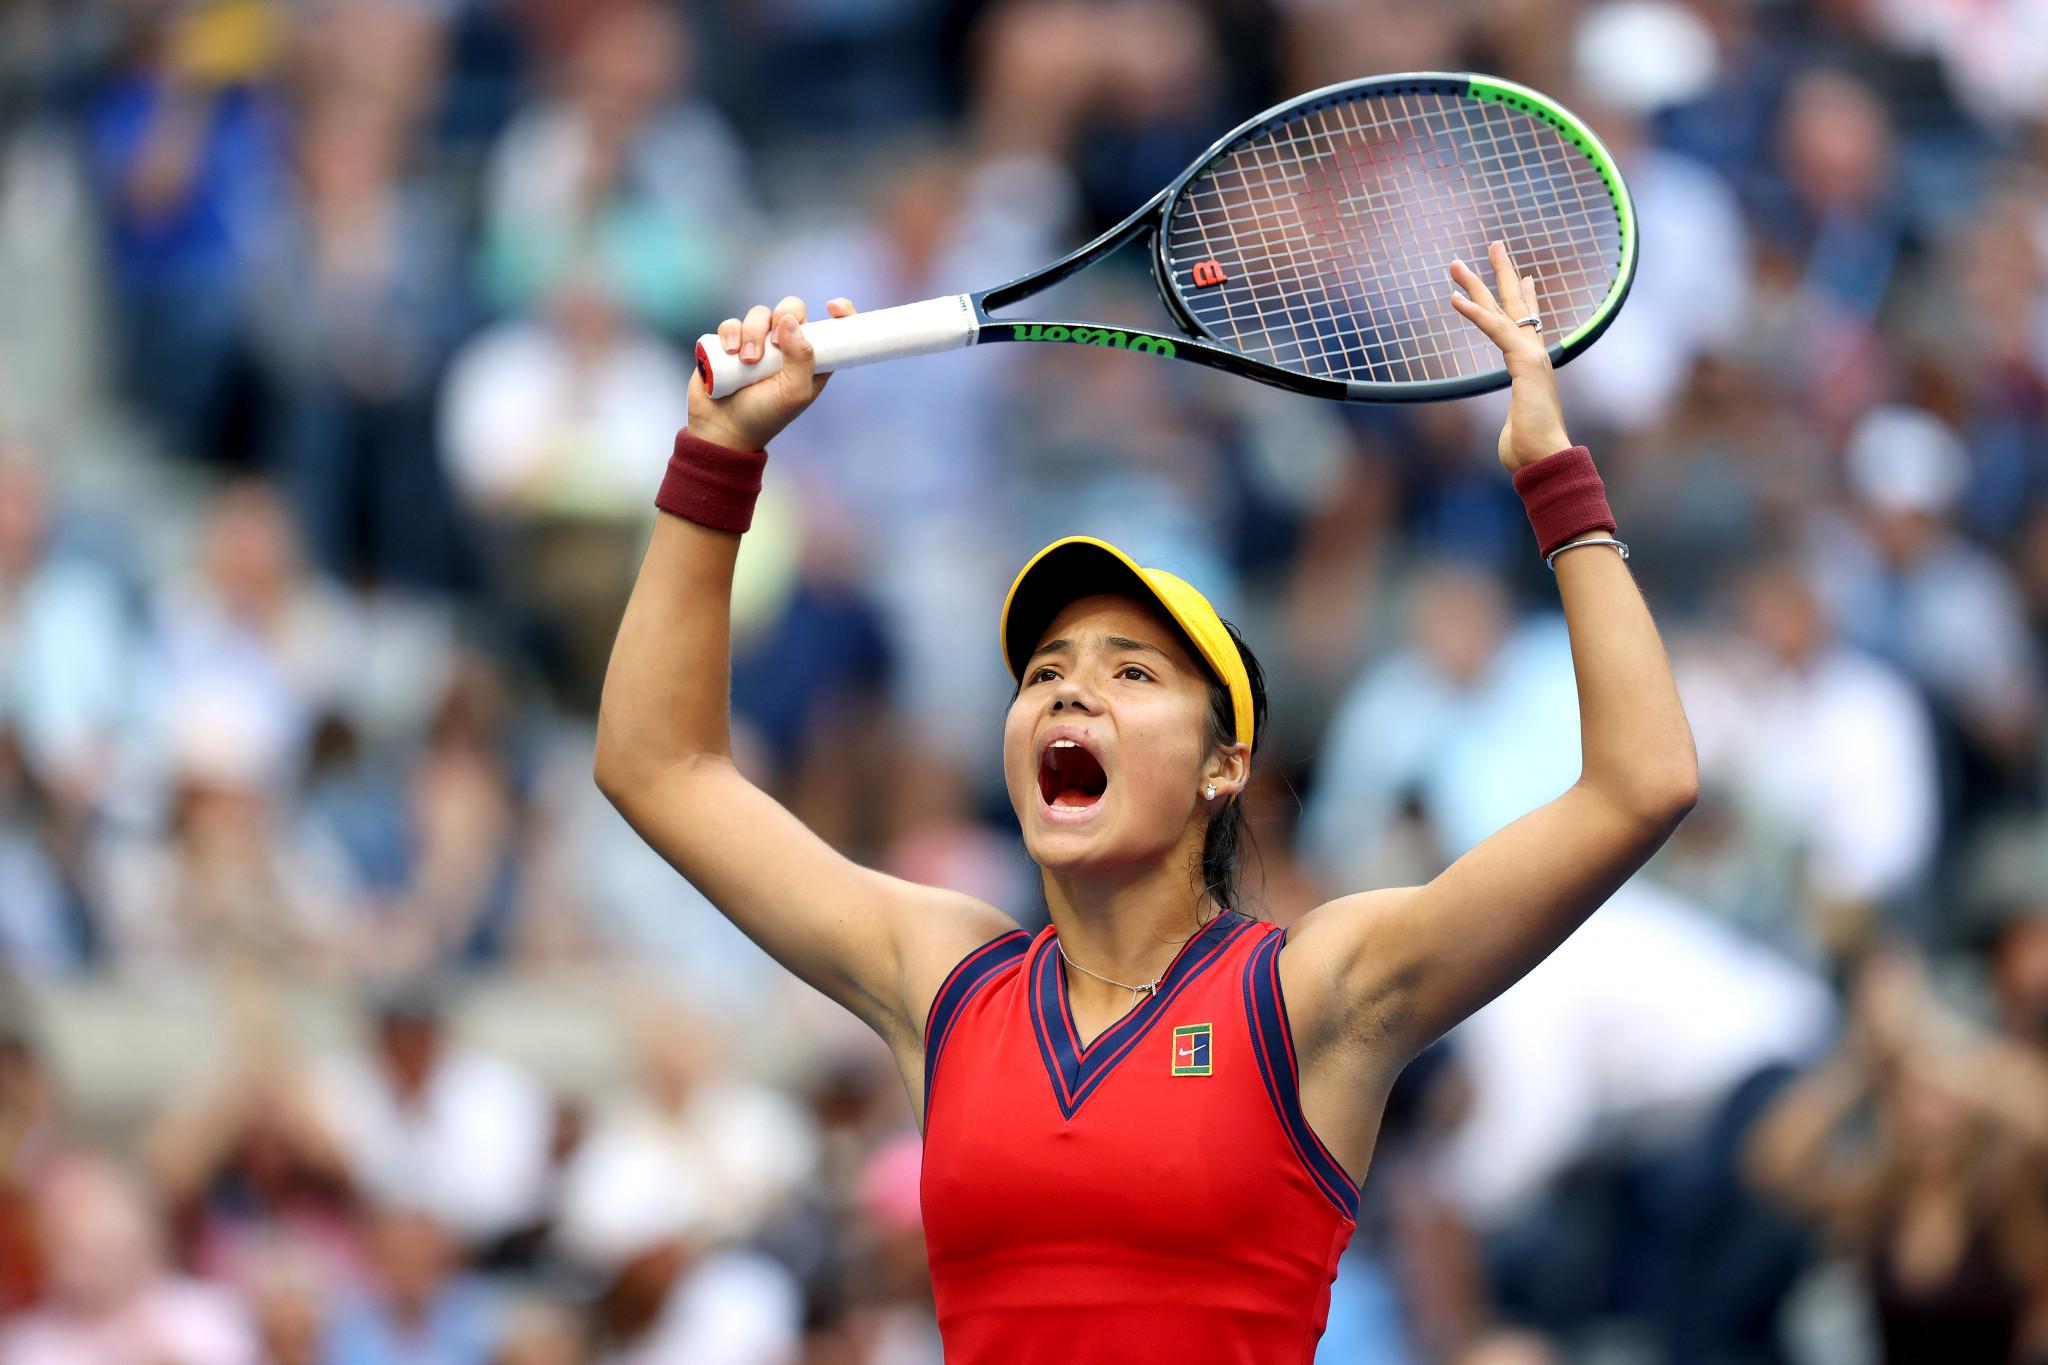 Sensational Raducanu beats Fernandez in all-teenage US Open final